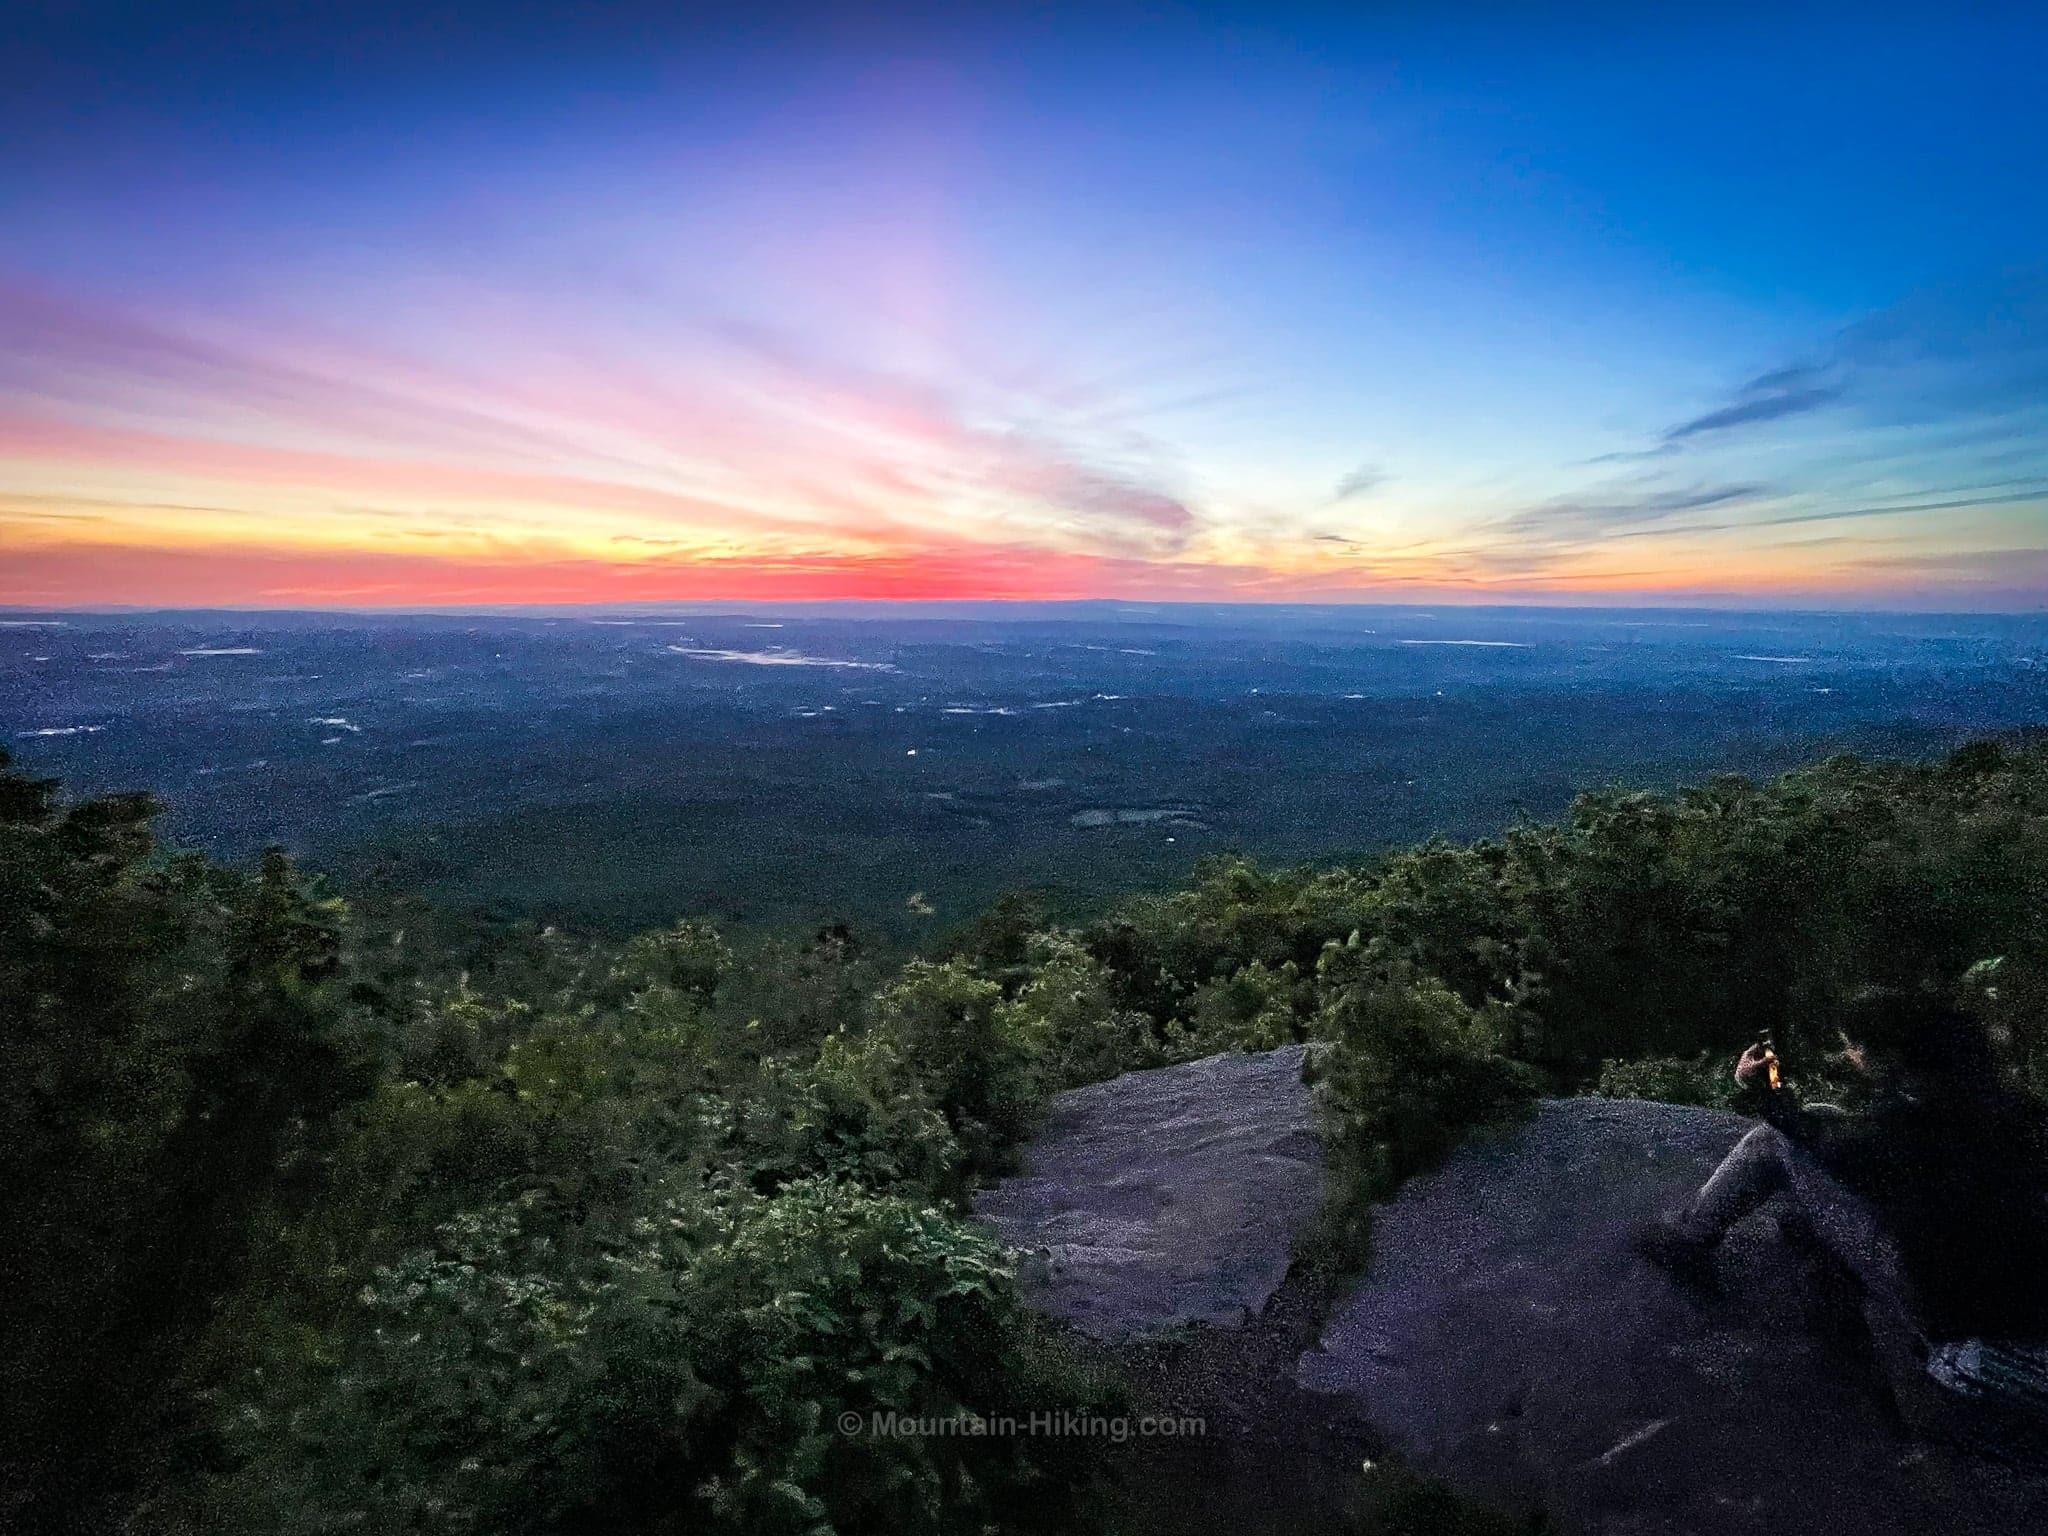 sky lit by pre-dawn sun